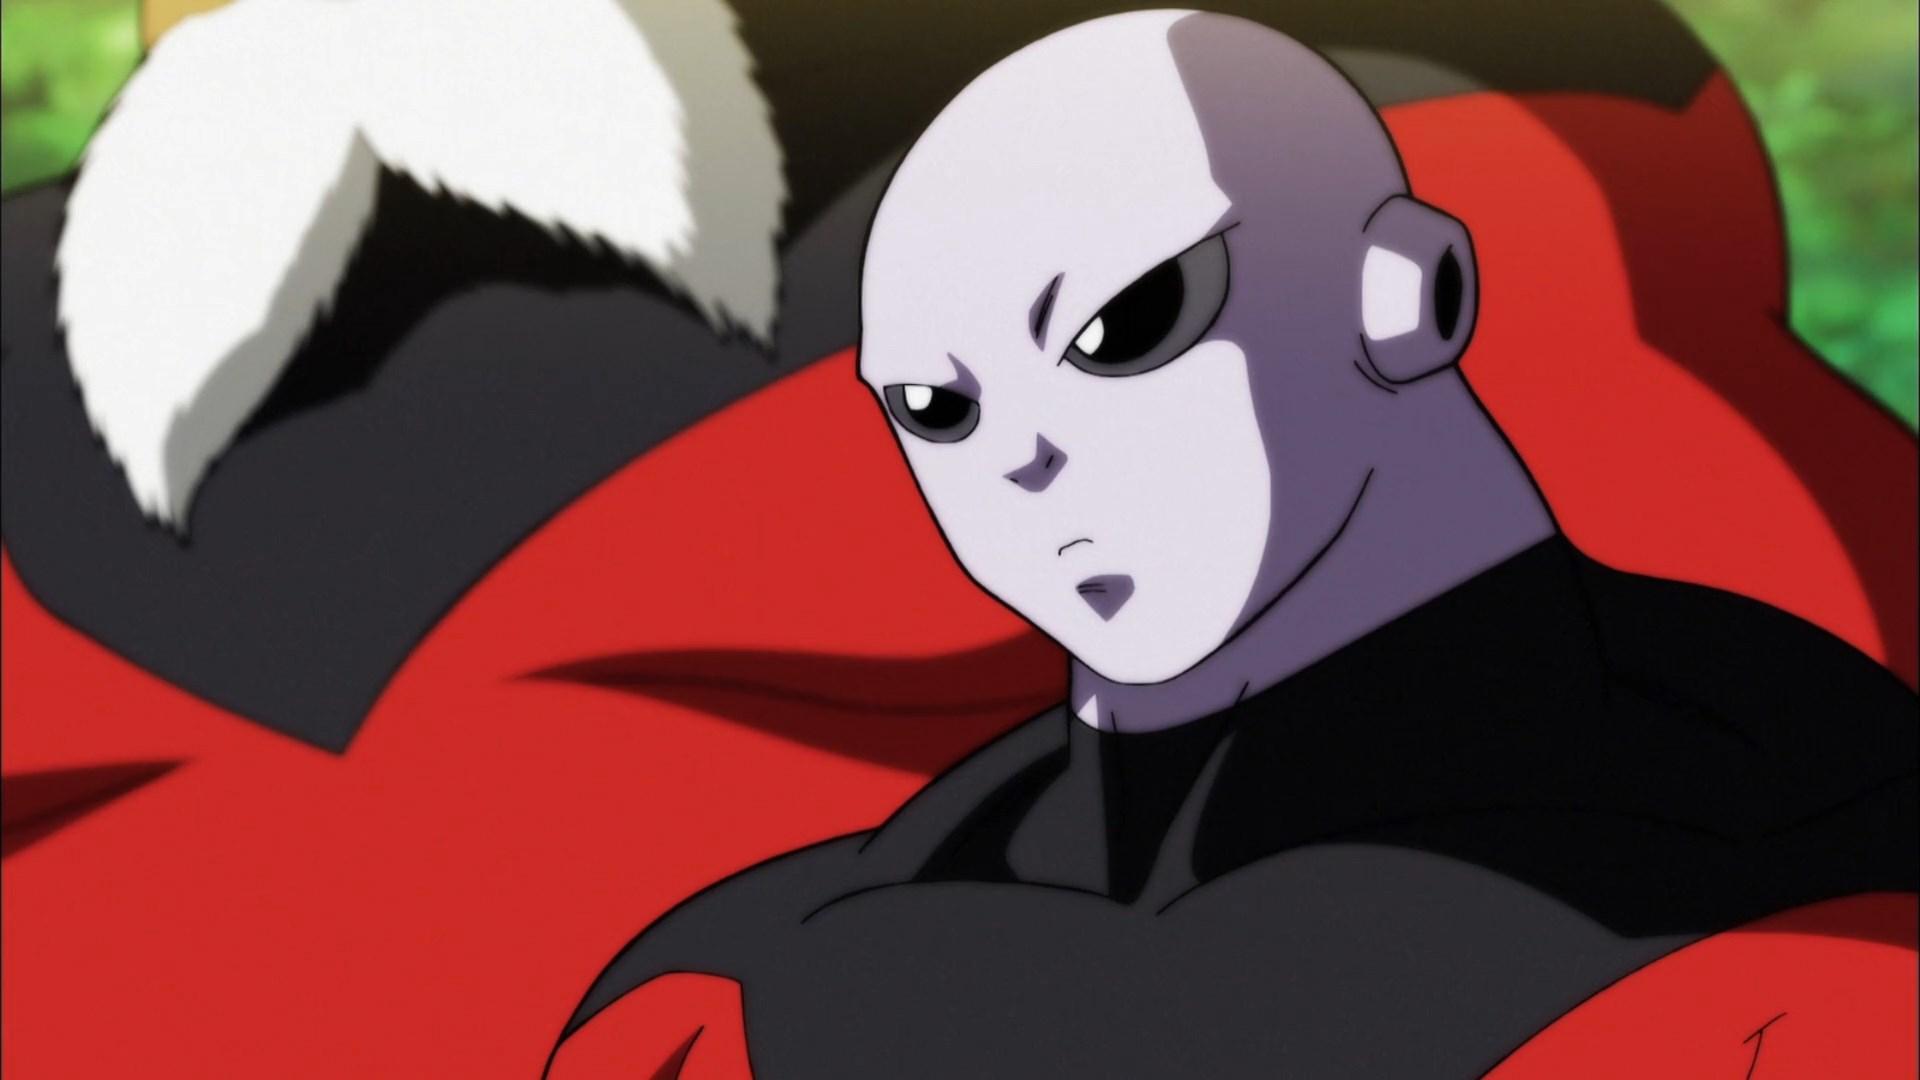 [HorribleSubs] Dragon Ball Super - 121 [1080p].mkv_snapshot_21.26